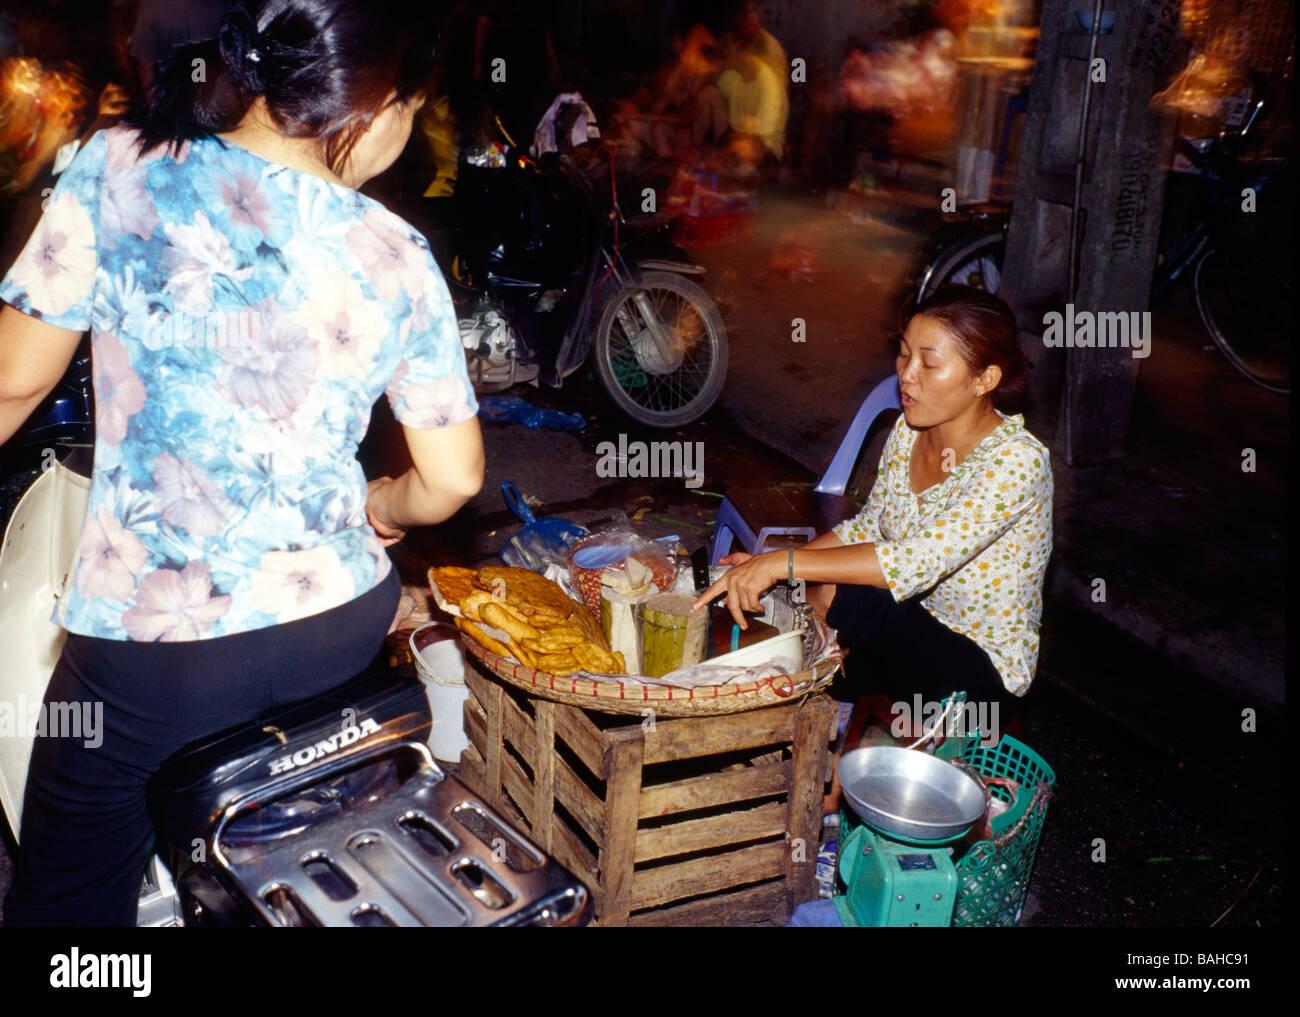 Stock Photo - street food vendor, night market, Hanoi, Vietnam